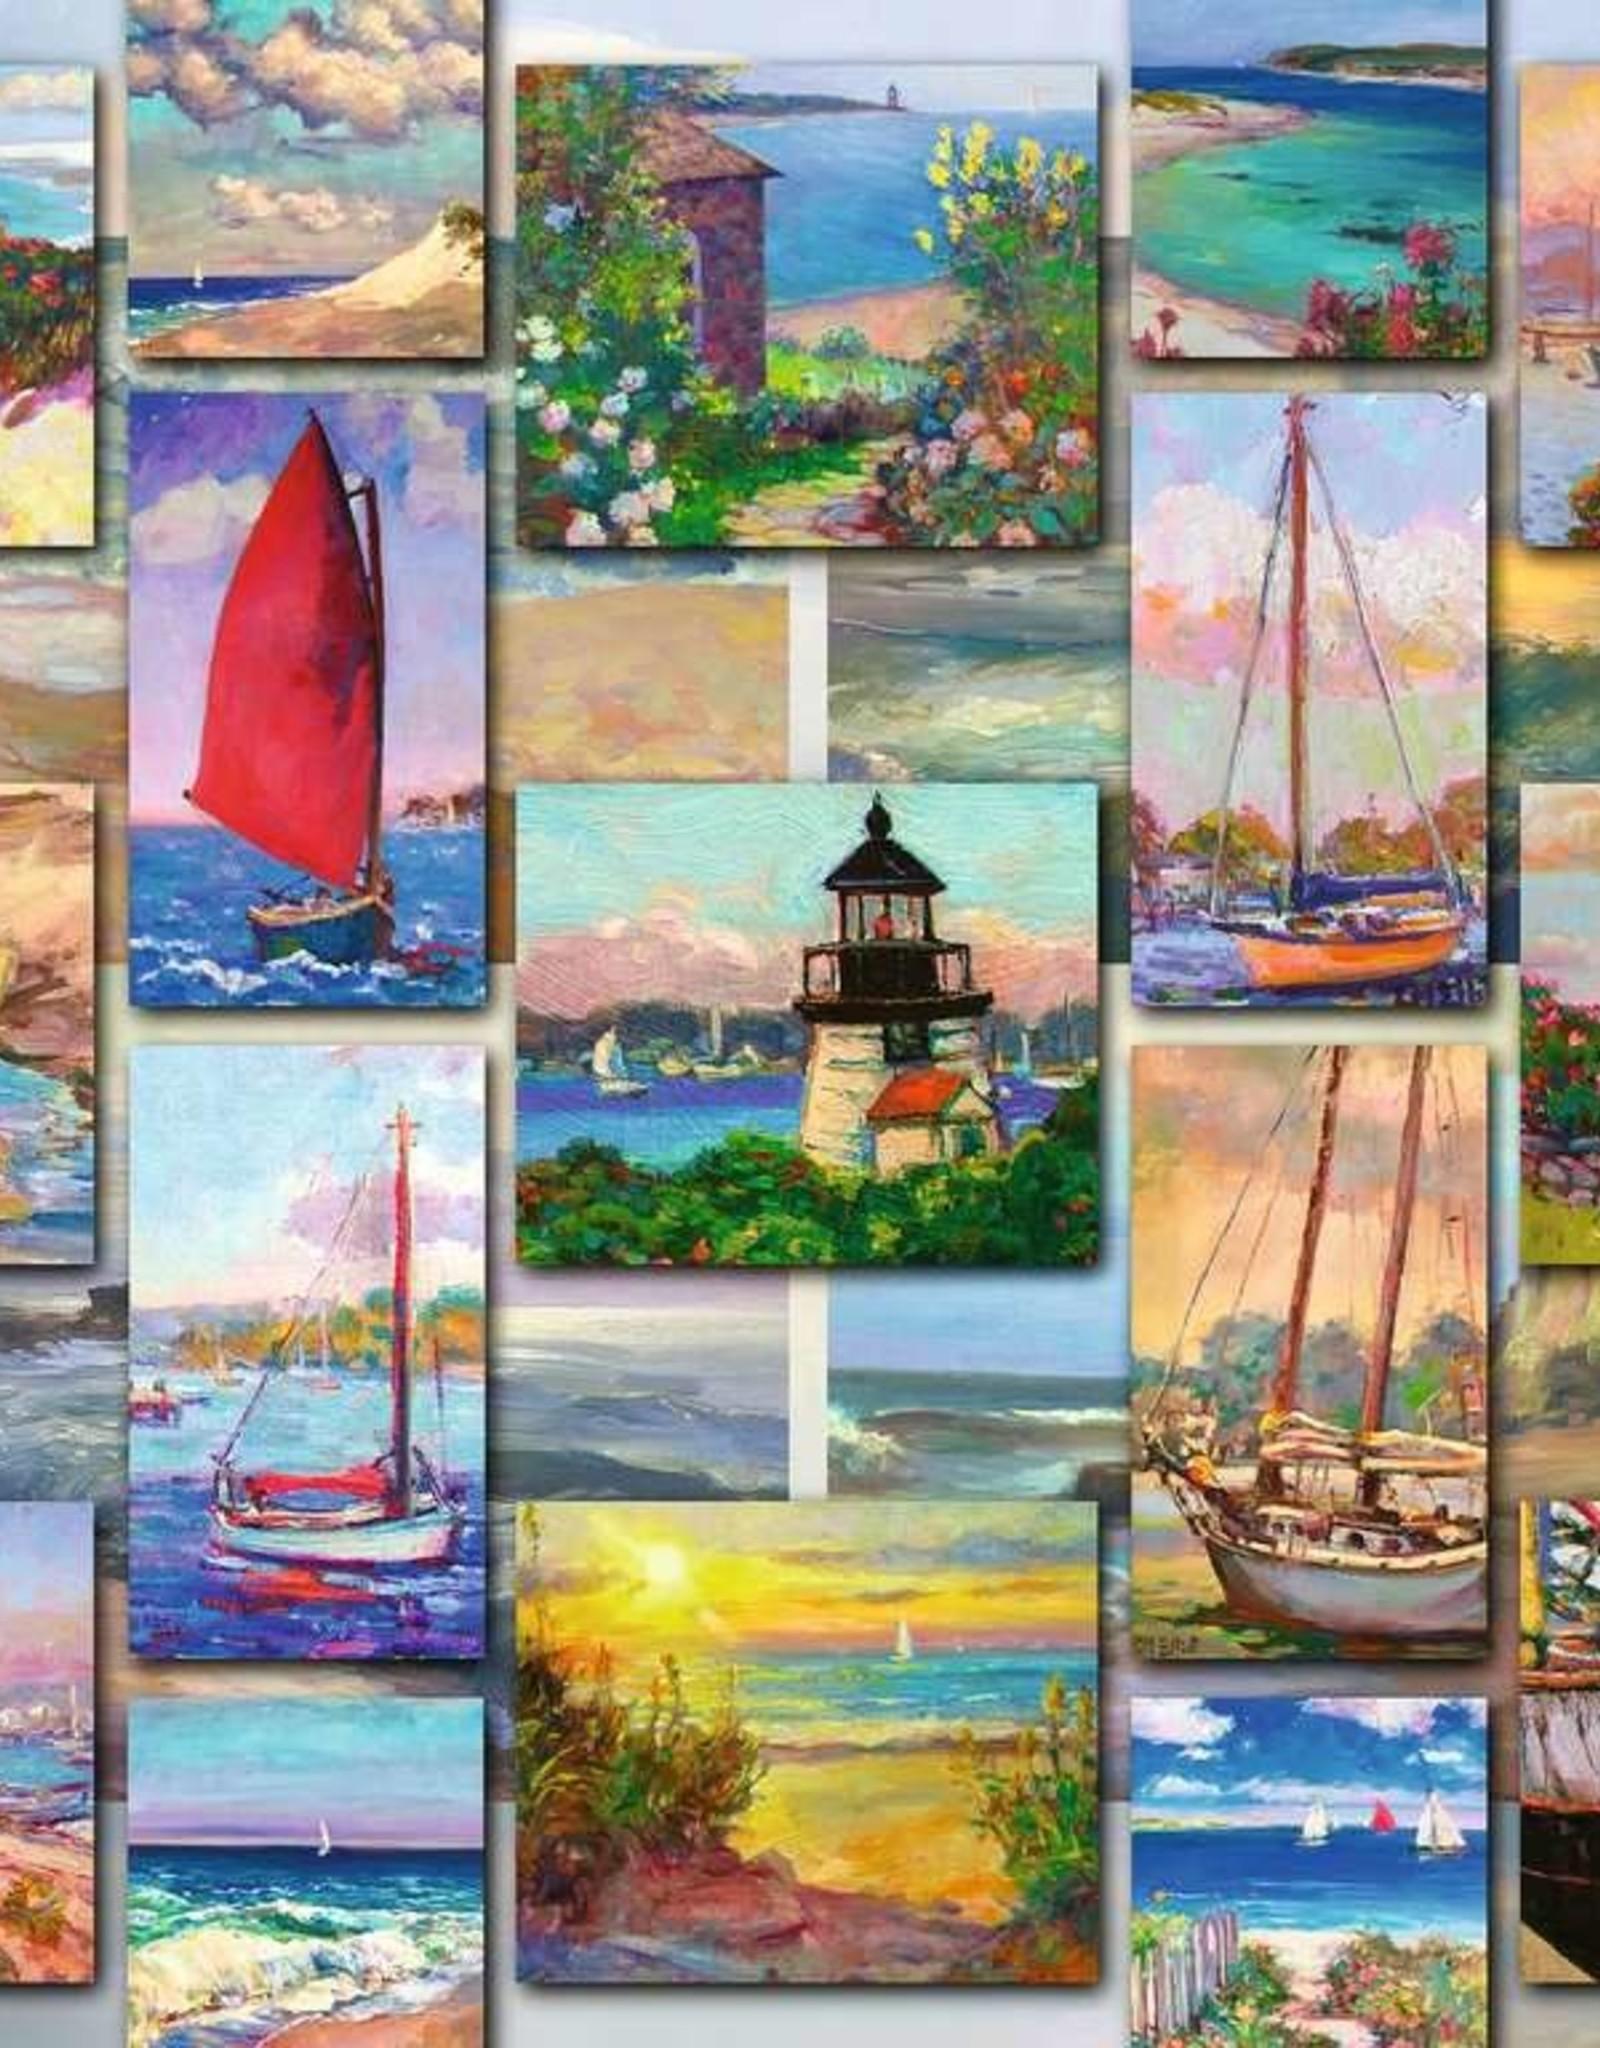 Ravensburger 1500pc Coastal Collage